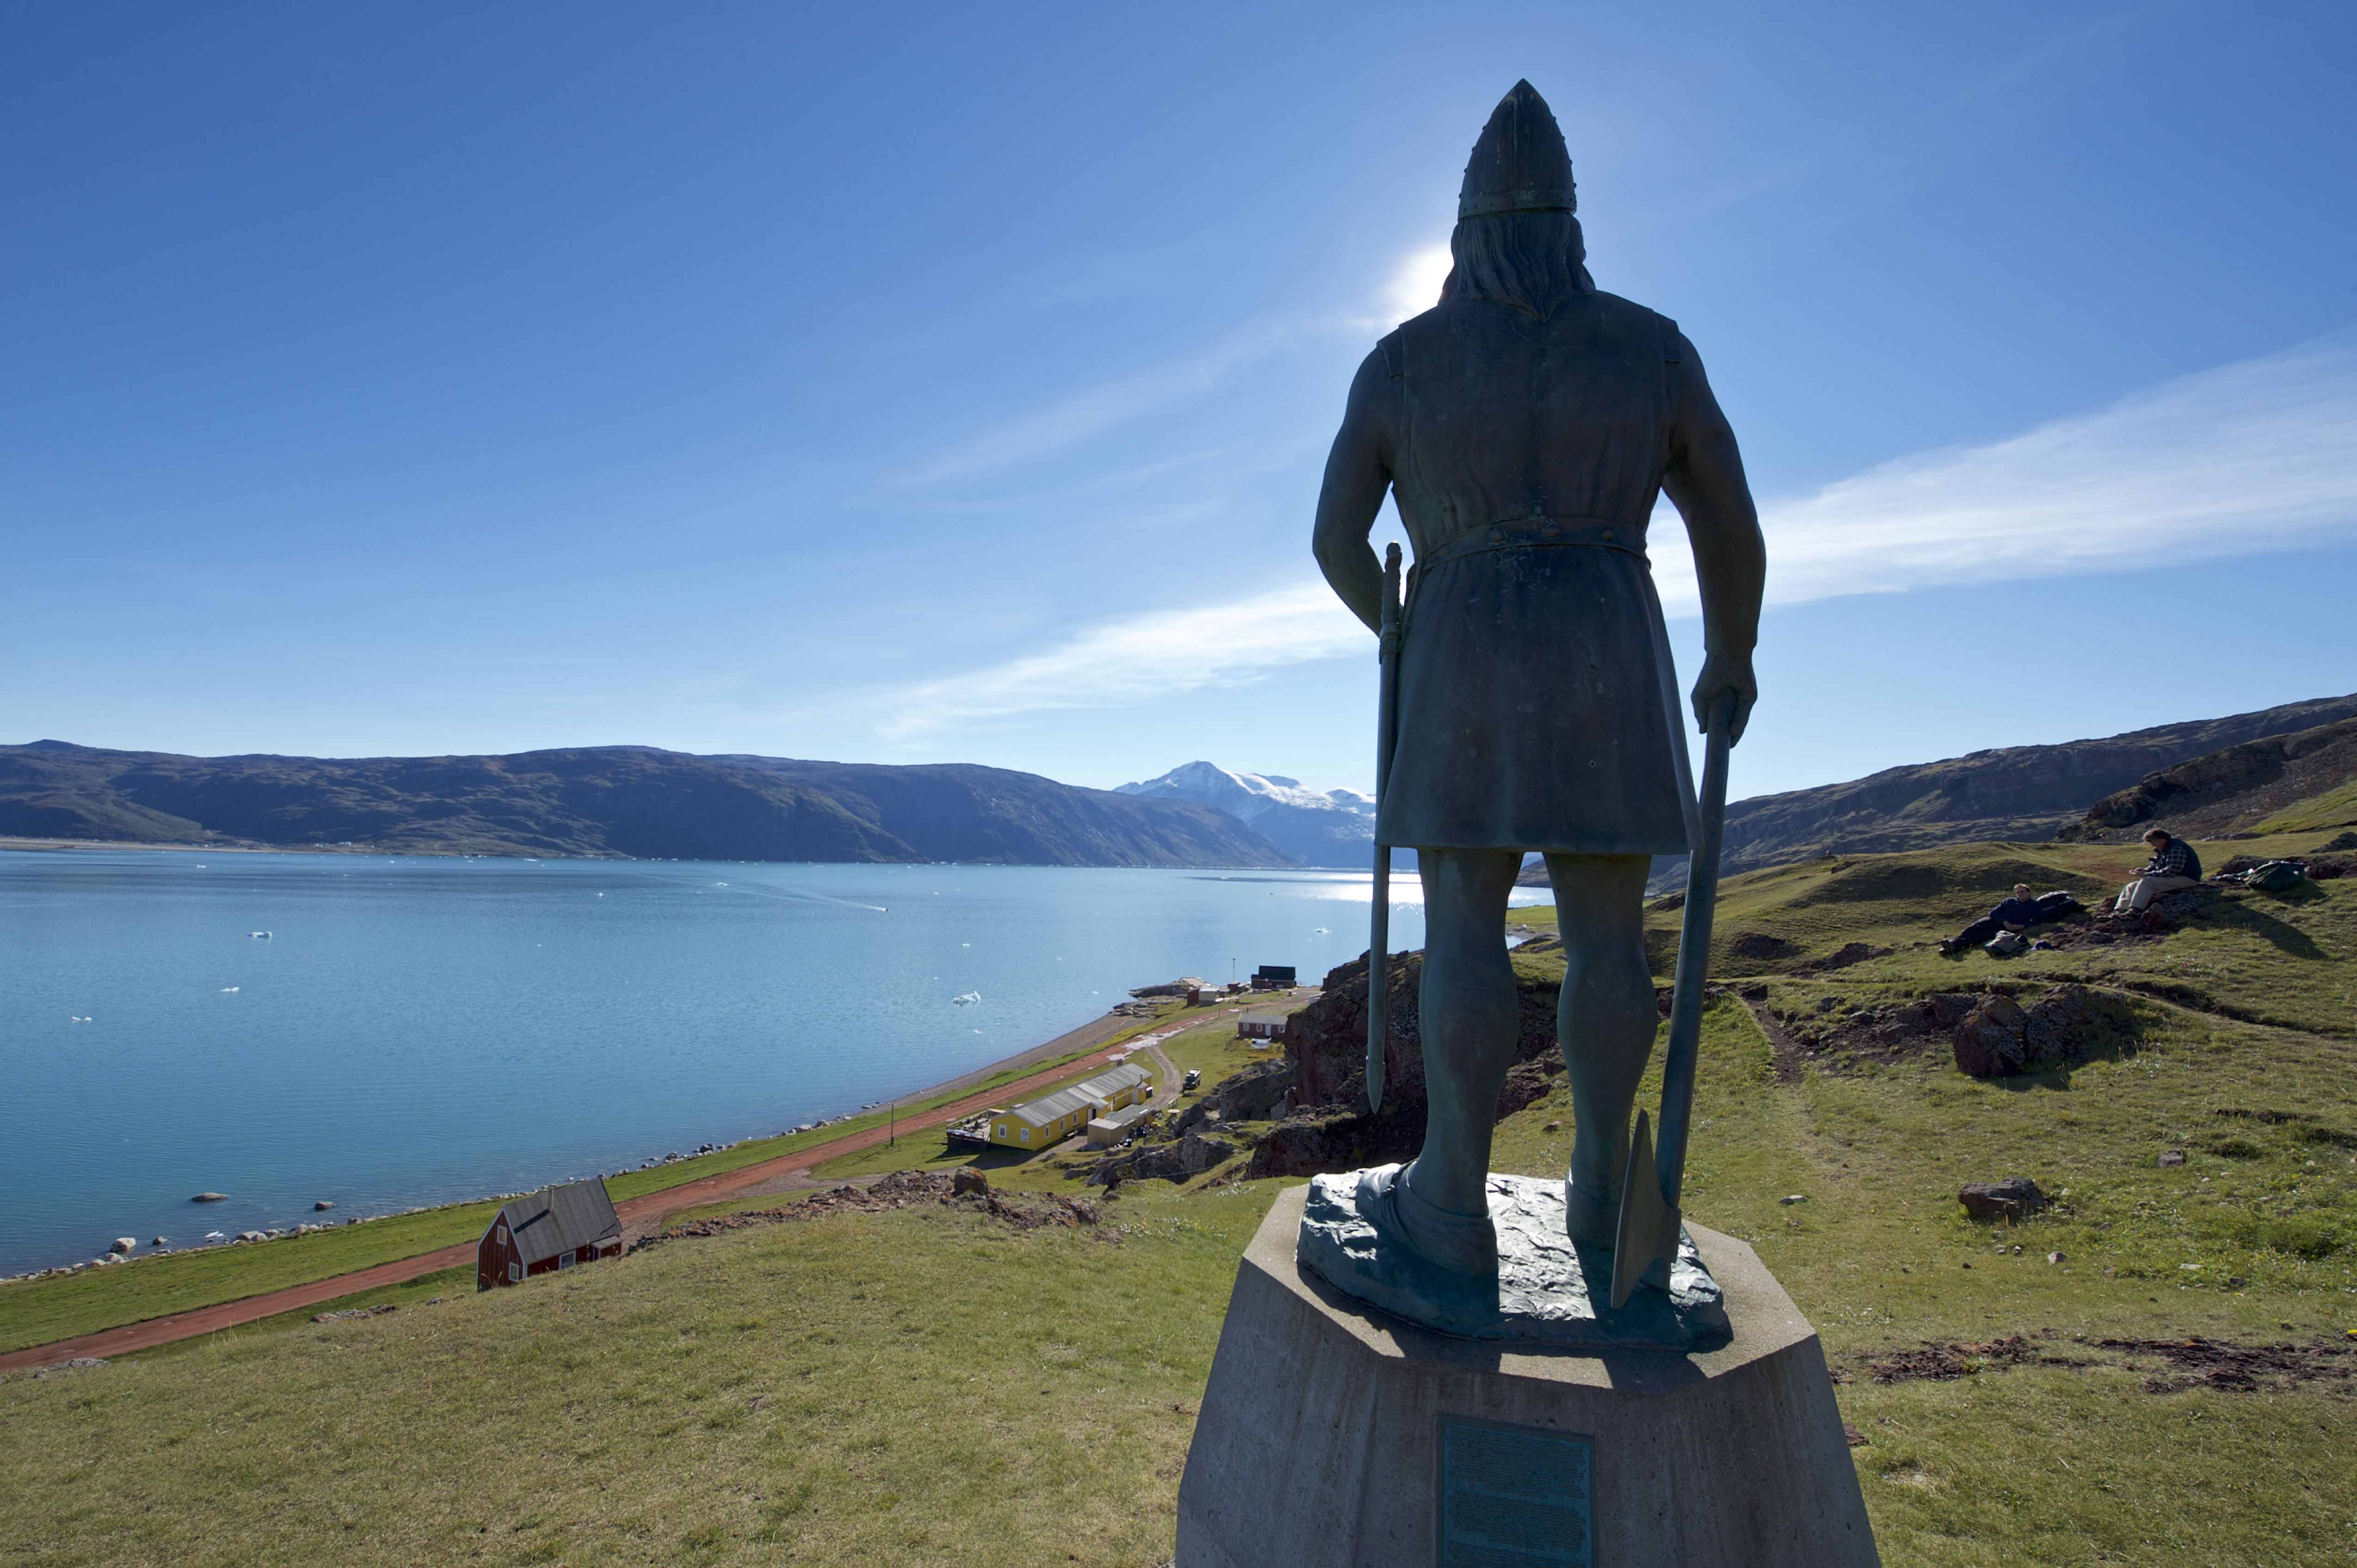 Statue of explorer Leif Ericson in Brattahlid/Qassiarsuk, Southern Greenland.